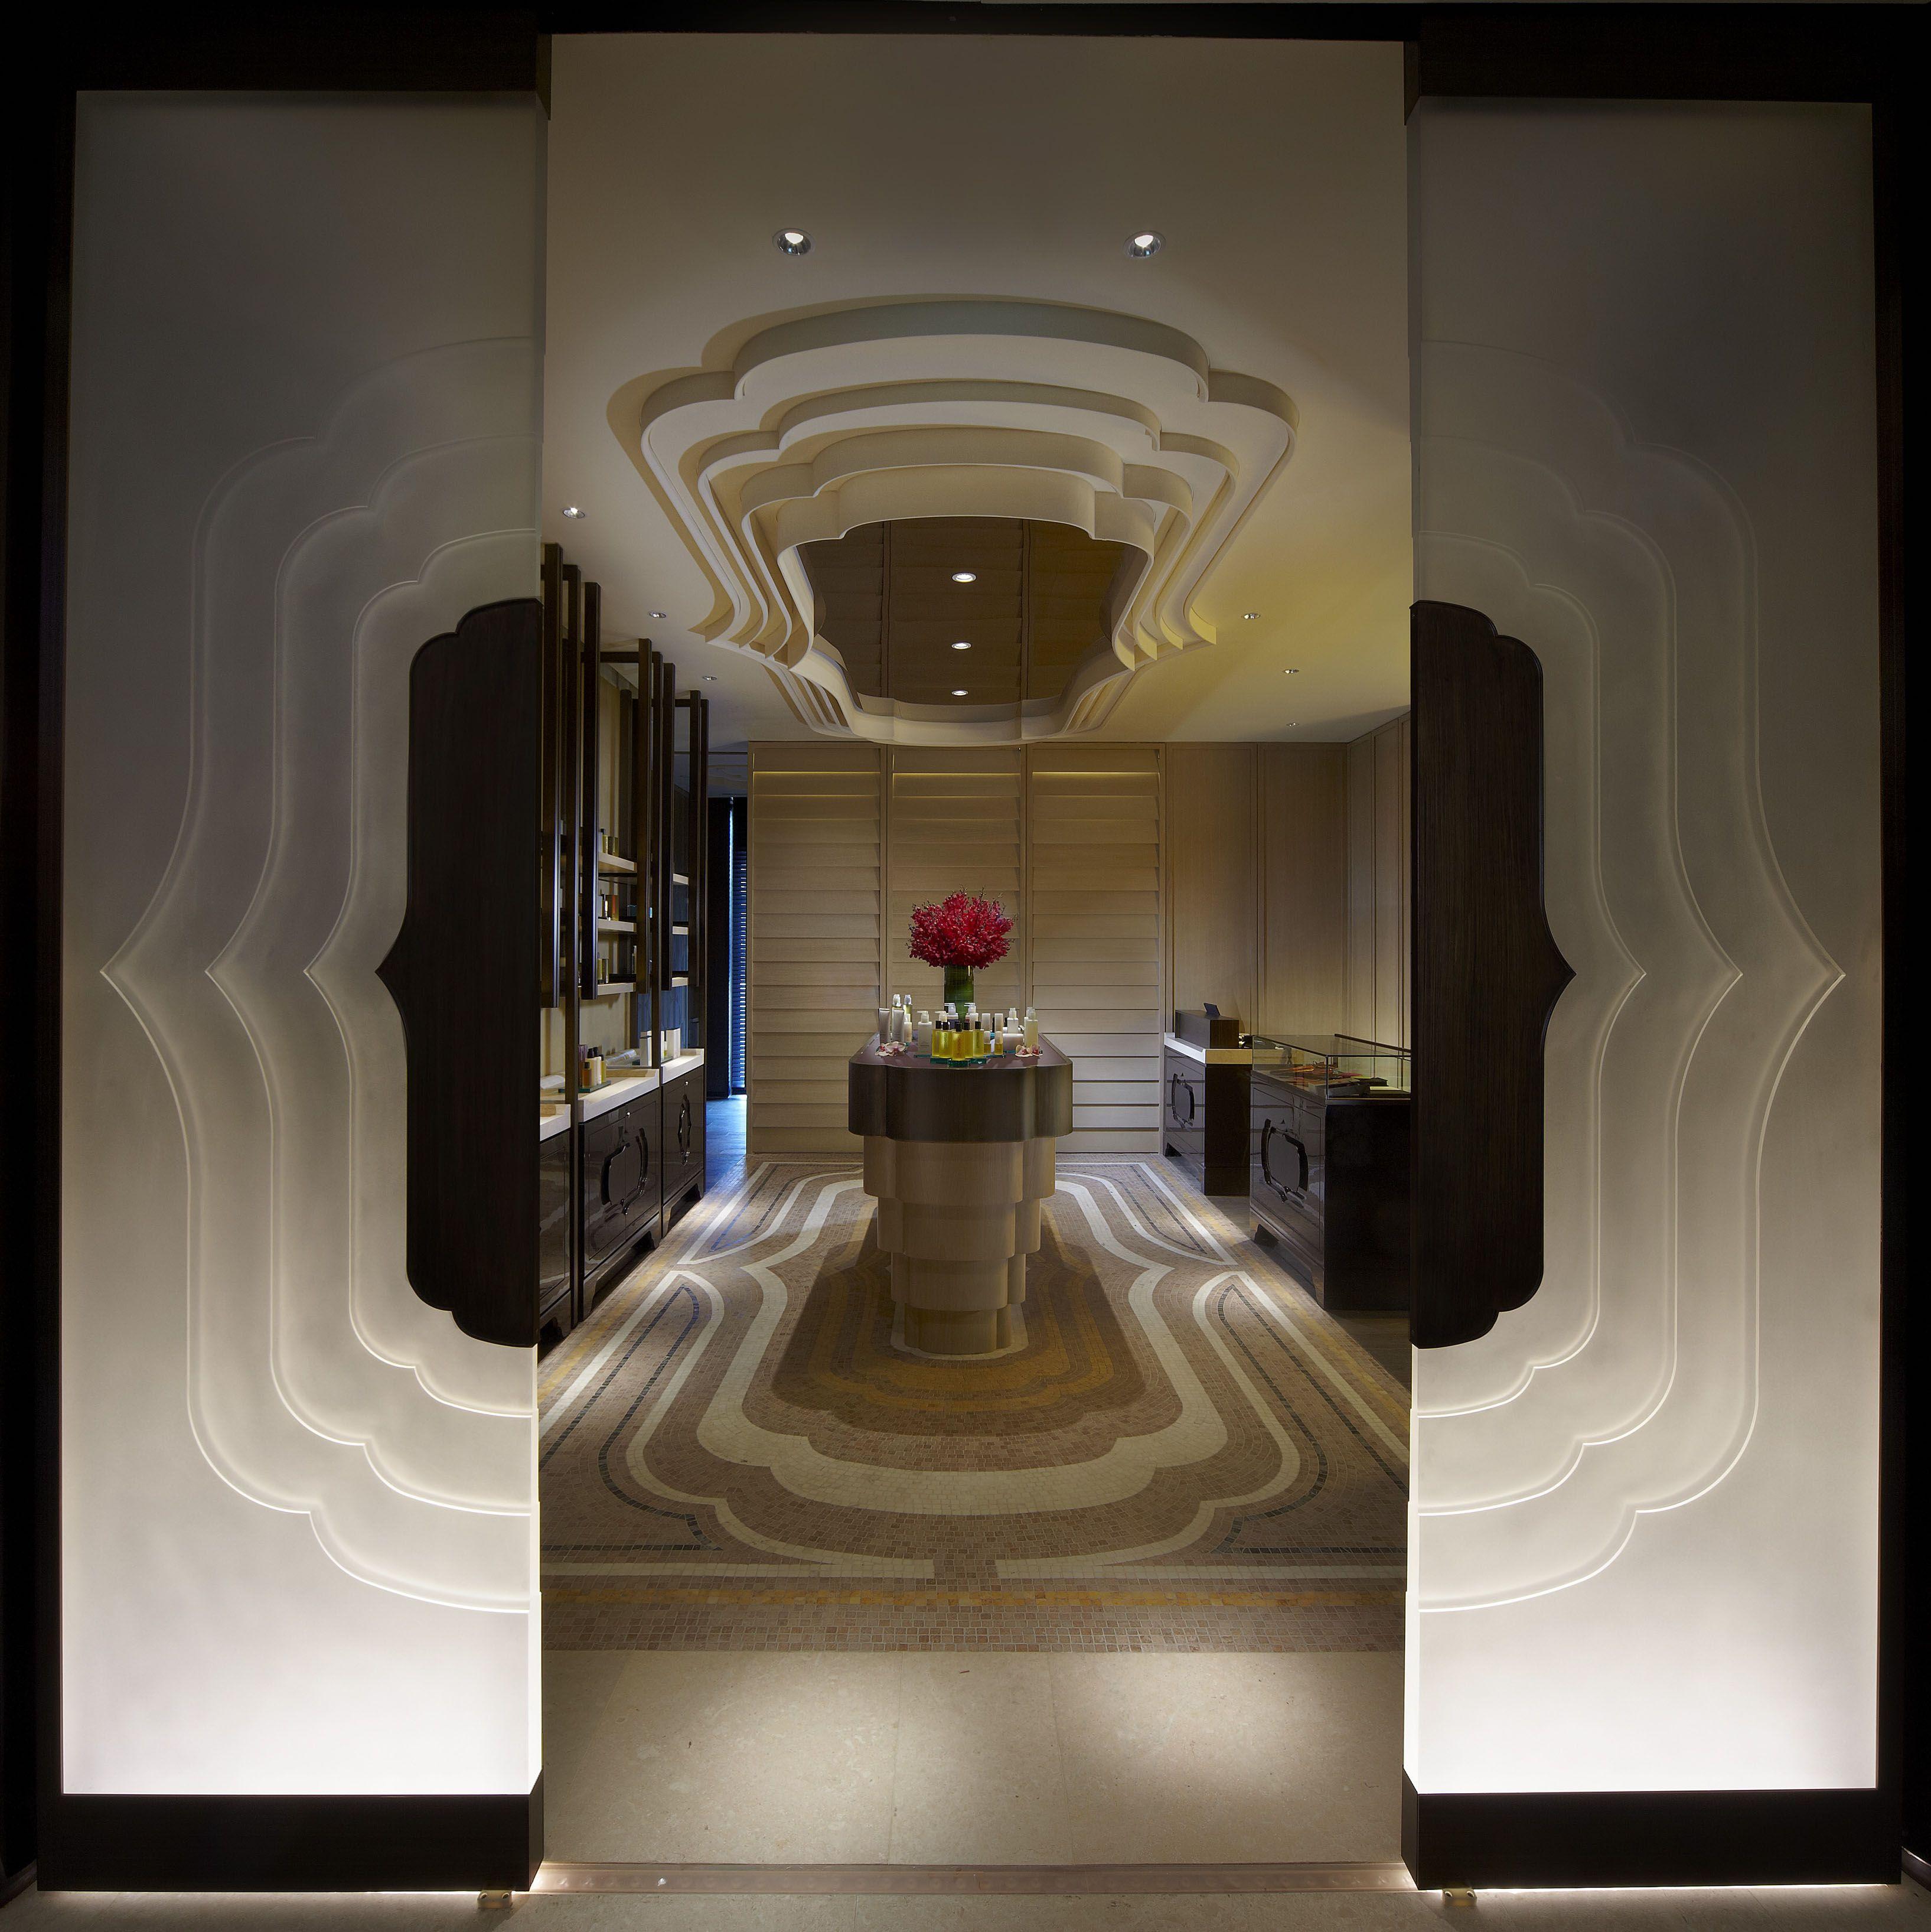 Fashion Design Interior Design Singapore: MANDARIN ORIENTAL, SINGAPORE UNVEILS A LUXURIOUS NEW